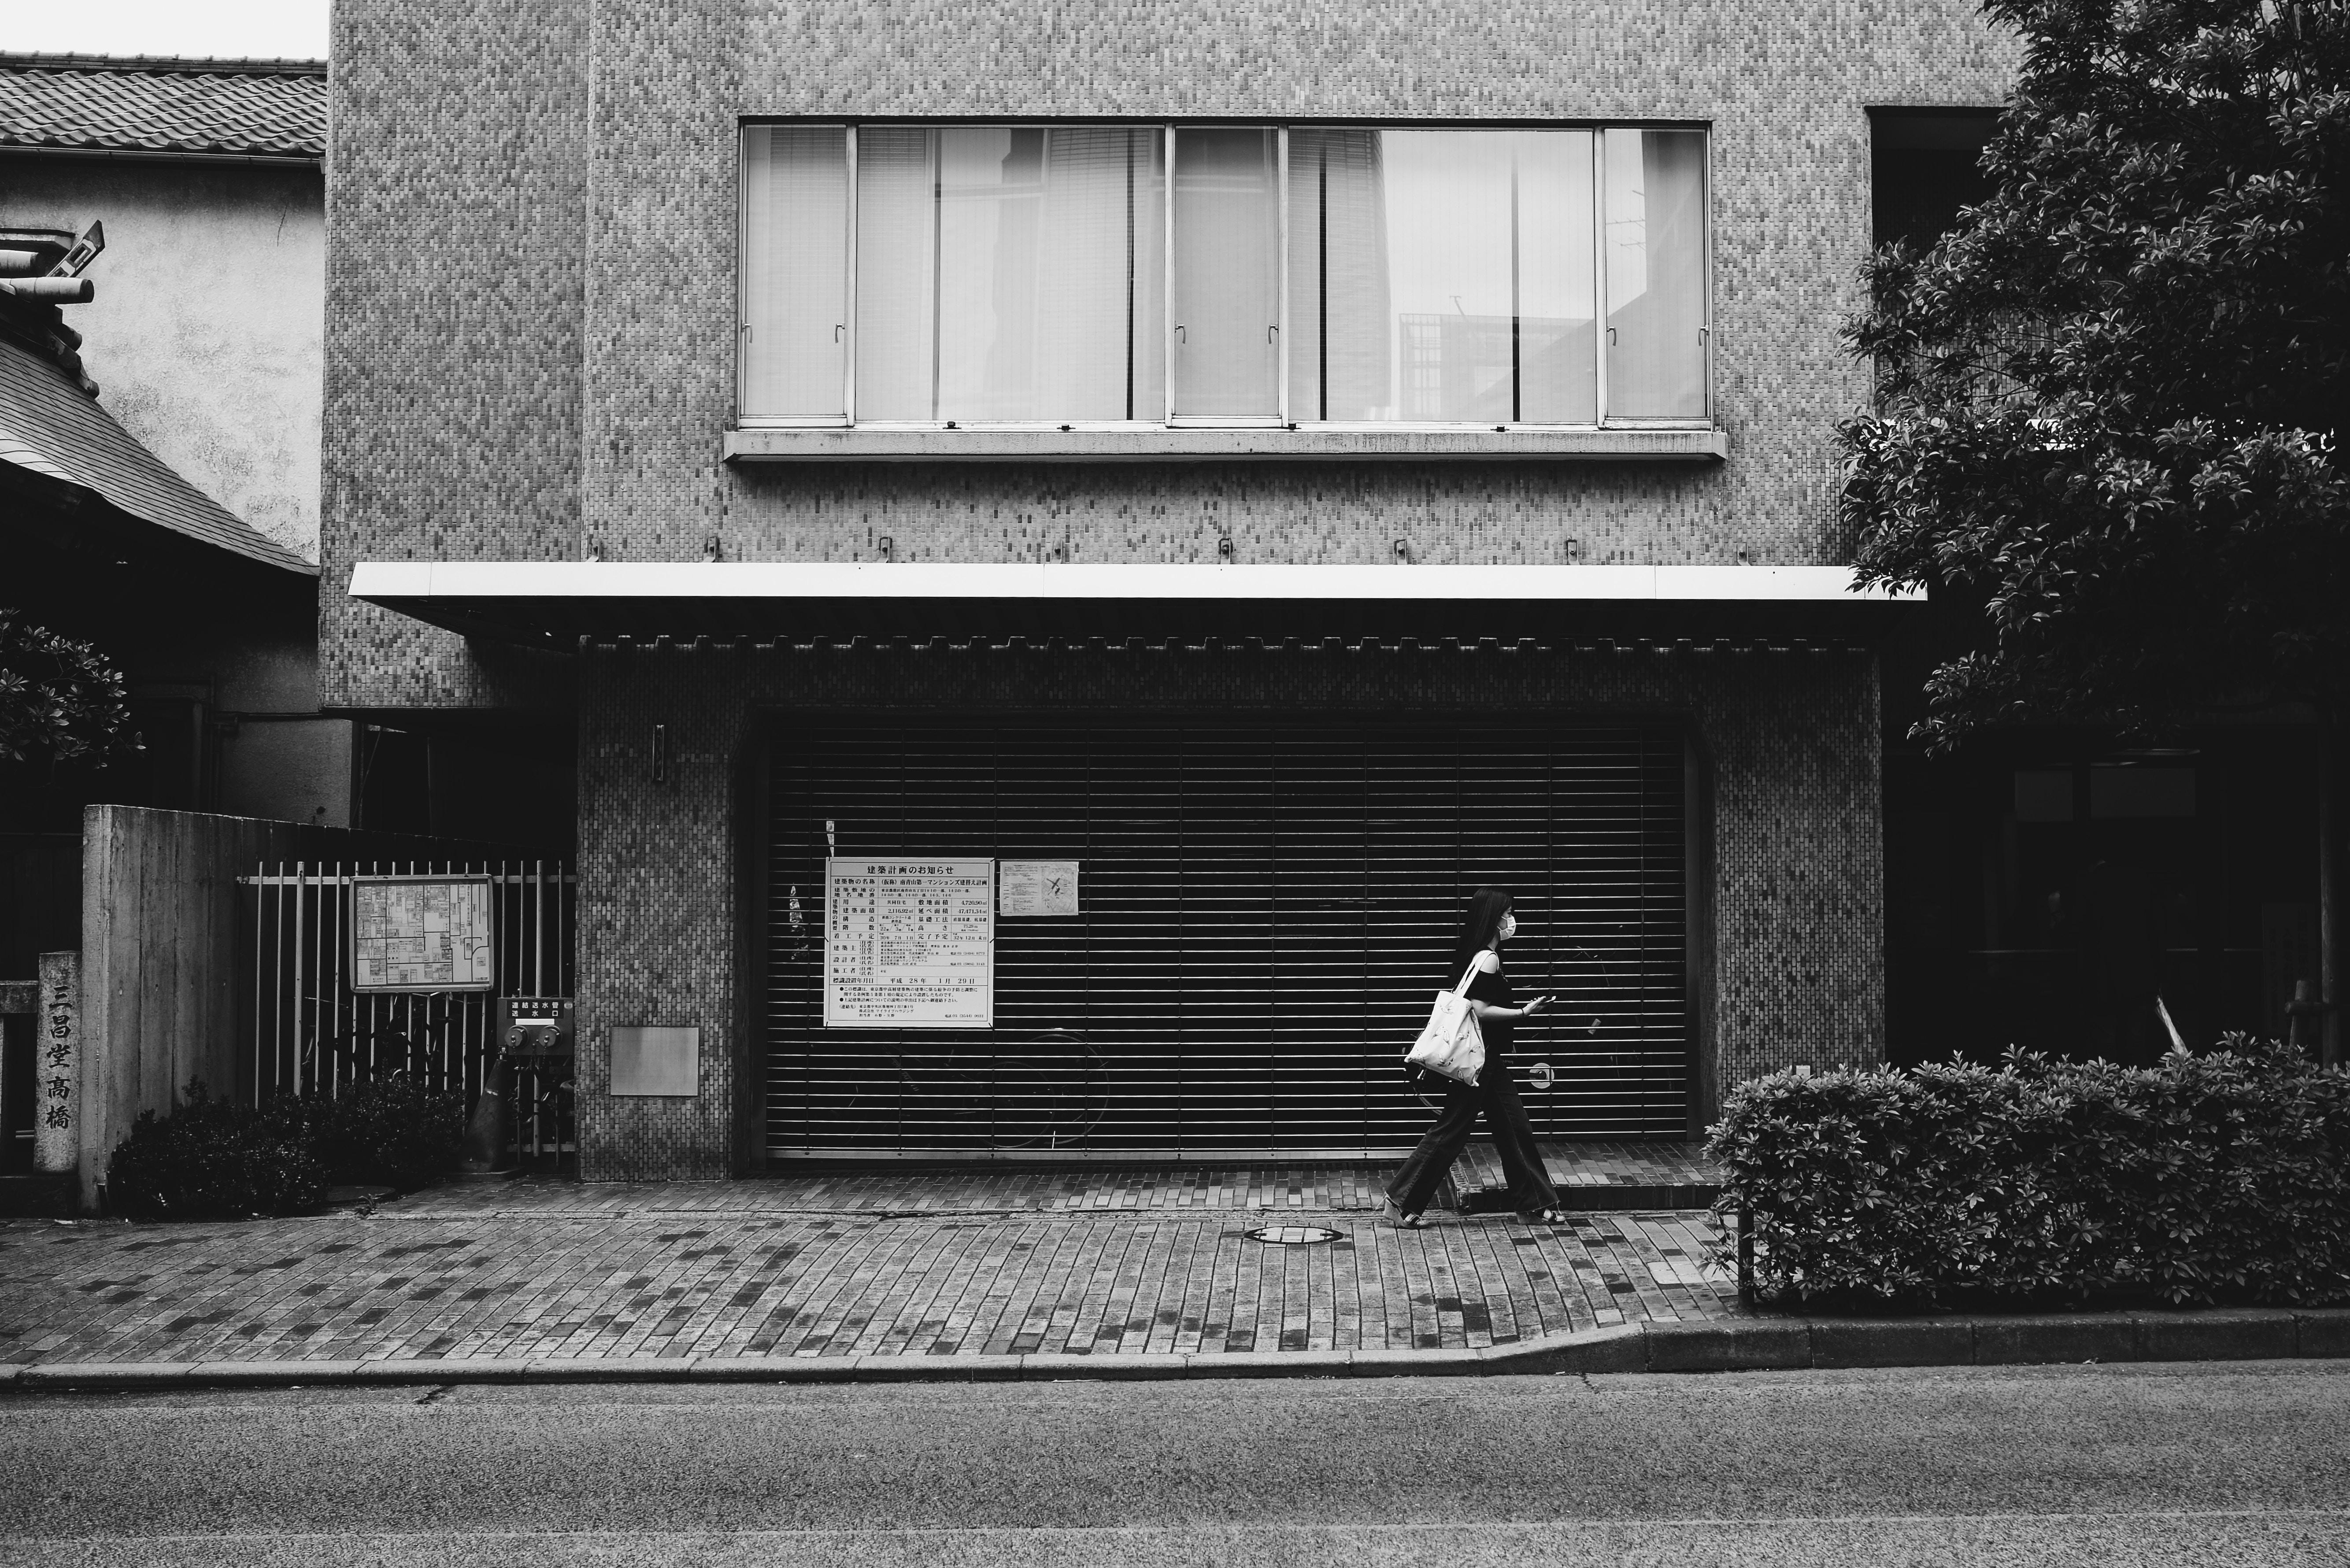 grayscale photo of woman walking beside building